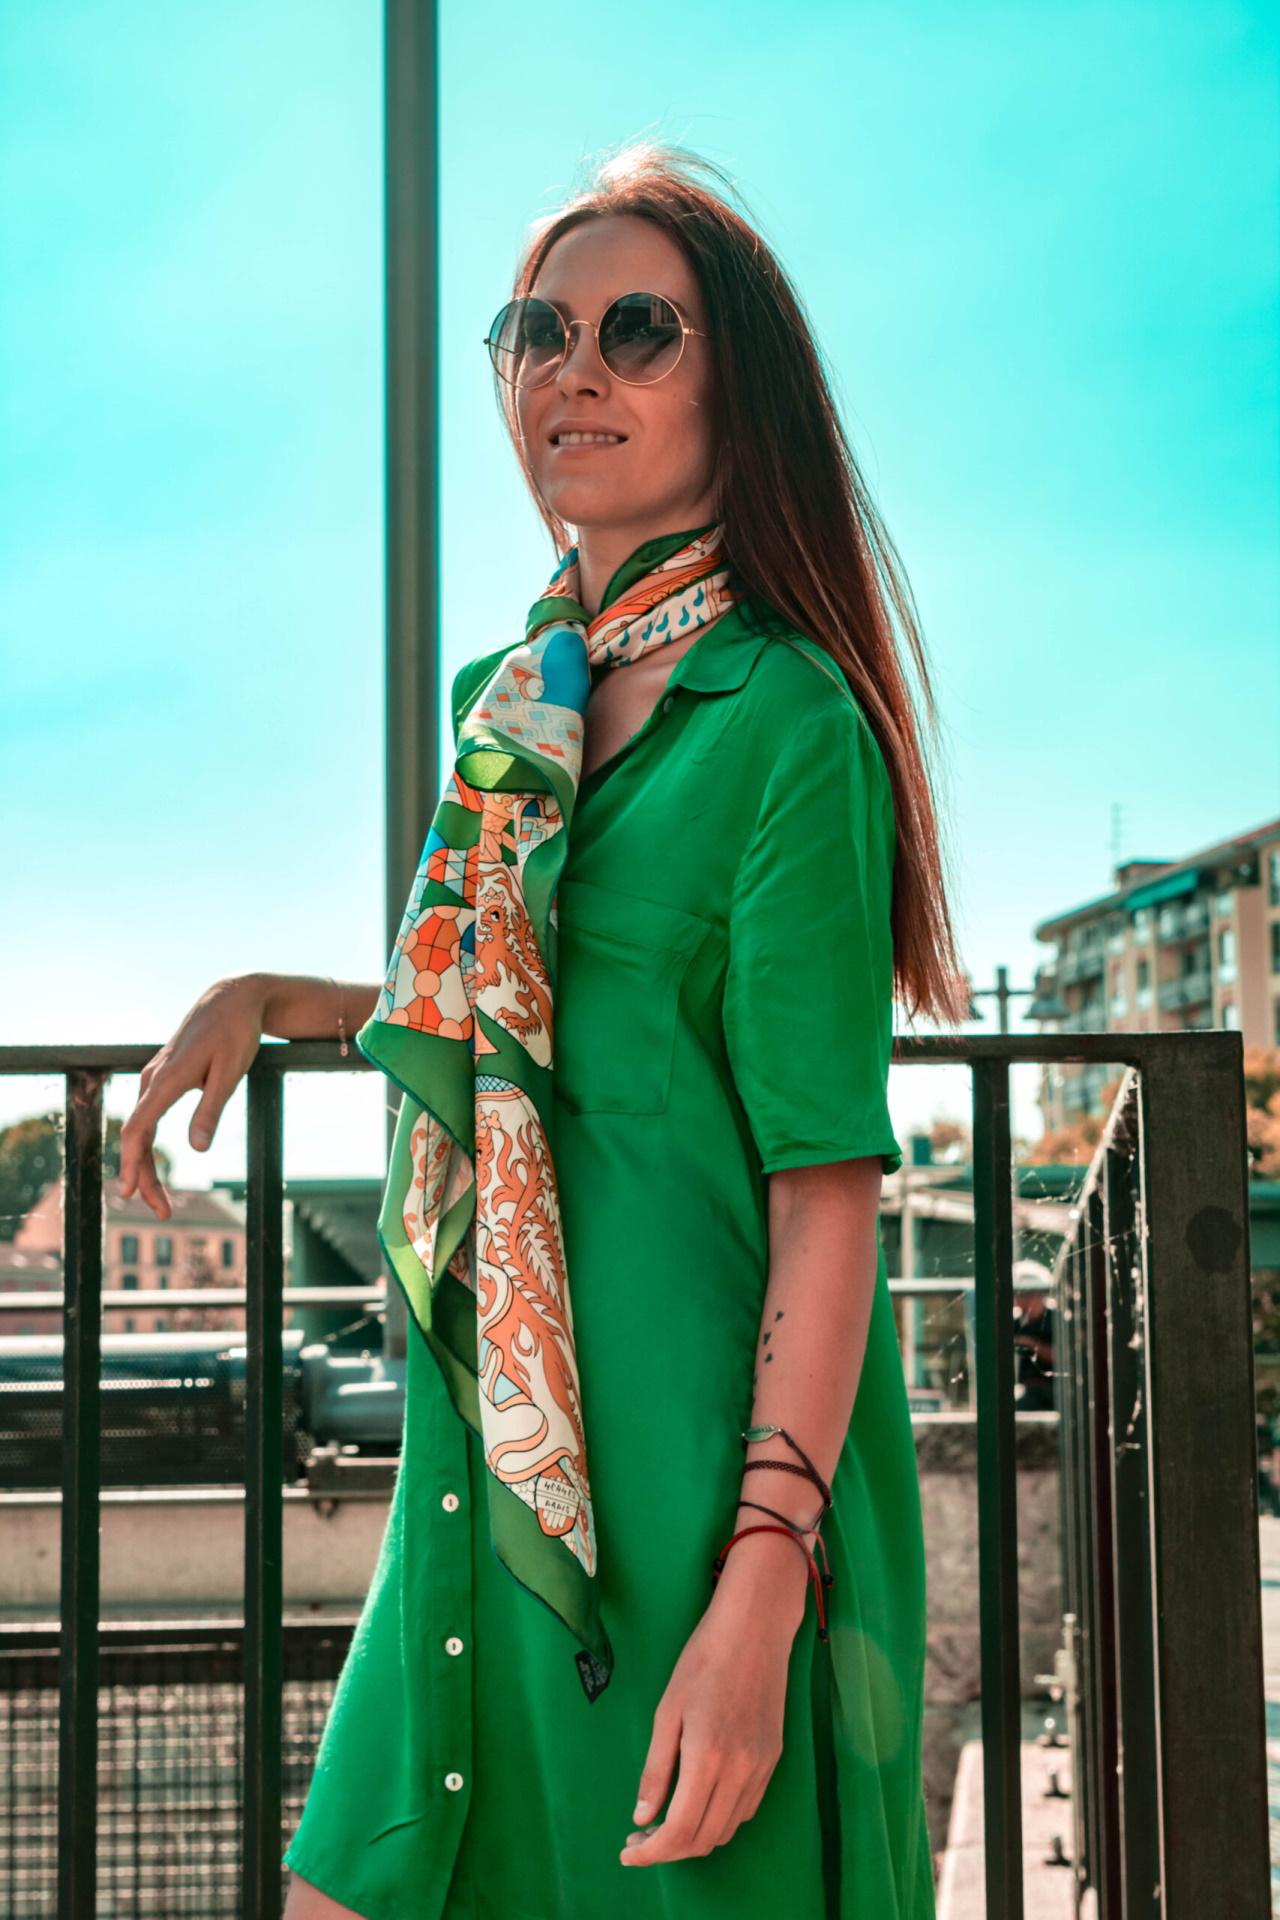 FOULARD A FOULARD SCIARPA DONNA 100 SETA 90CMX90CM 3 1stAmerican foulard/sciarpa 100% seta da donna 90cmx90cm